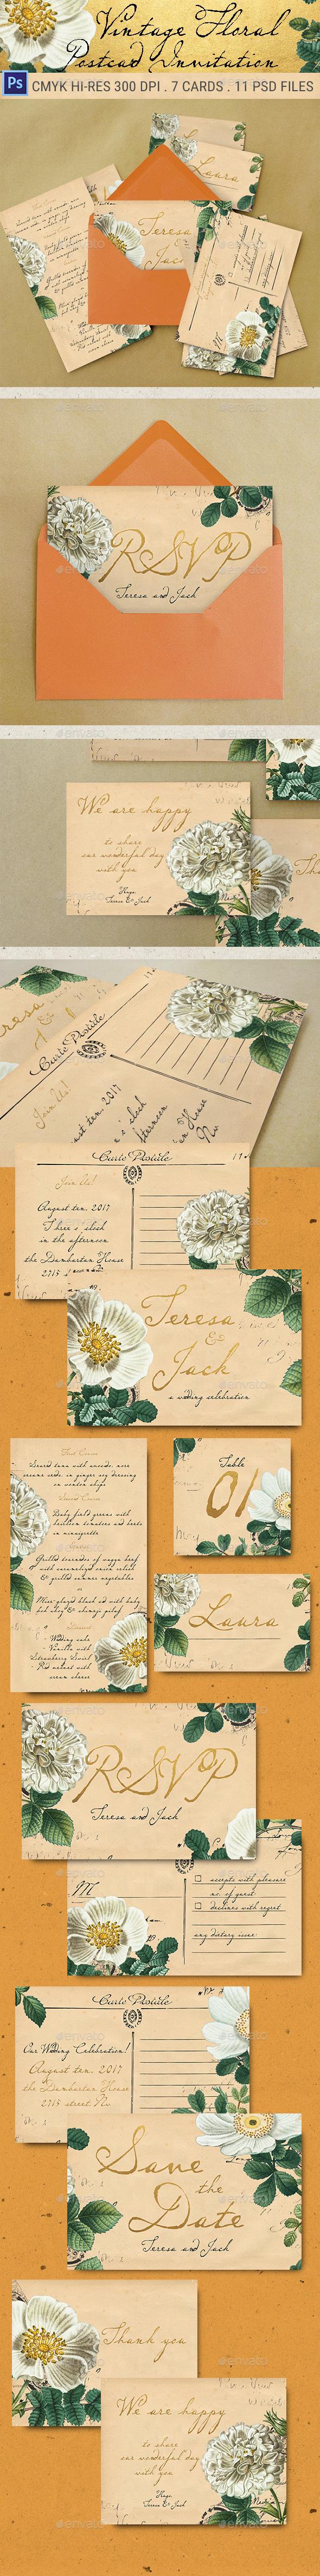 Vintage Floral Postcard Wedding Invitation Package